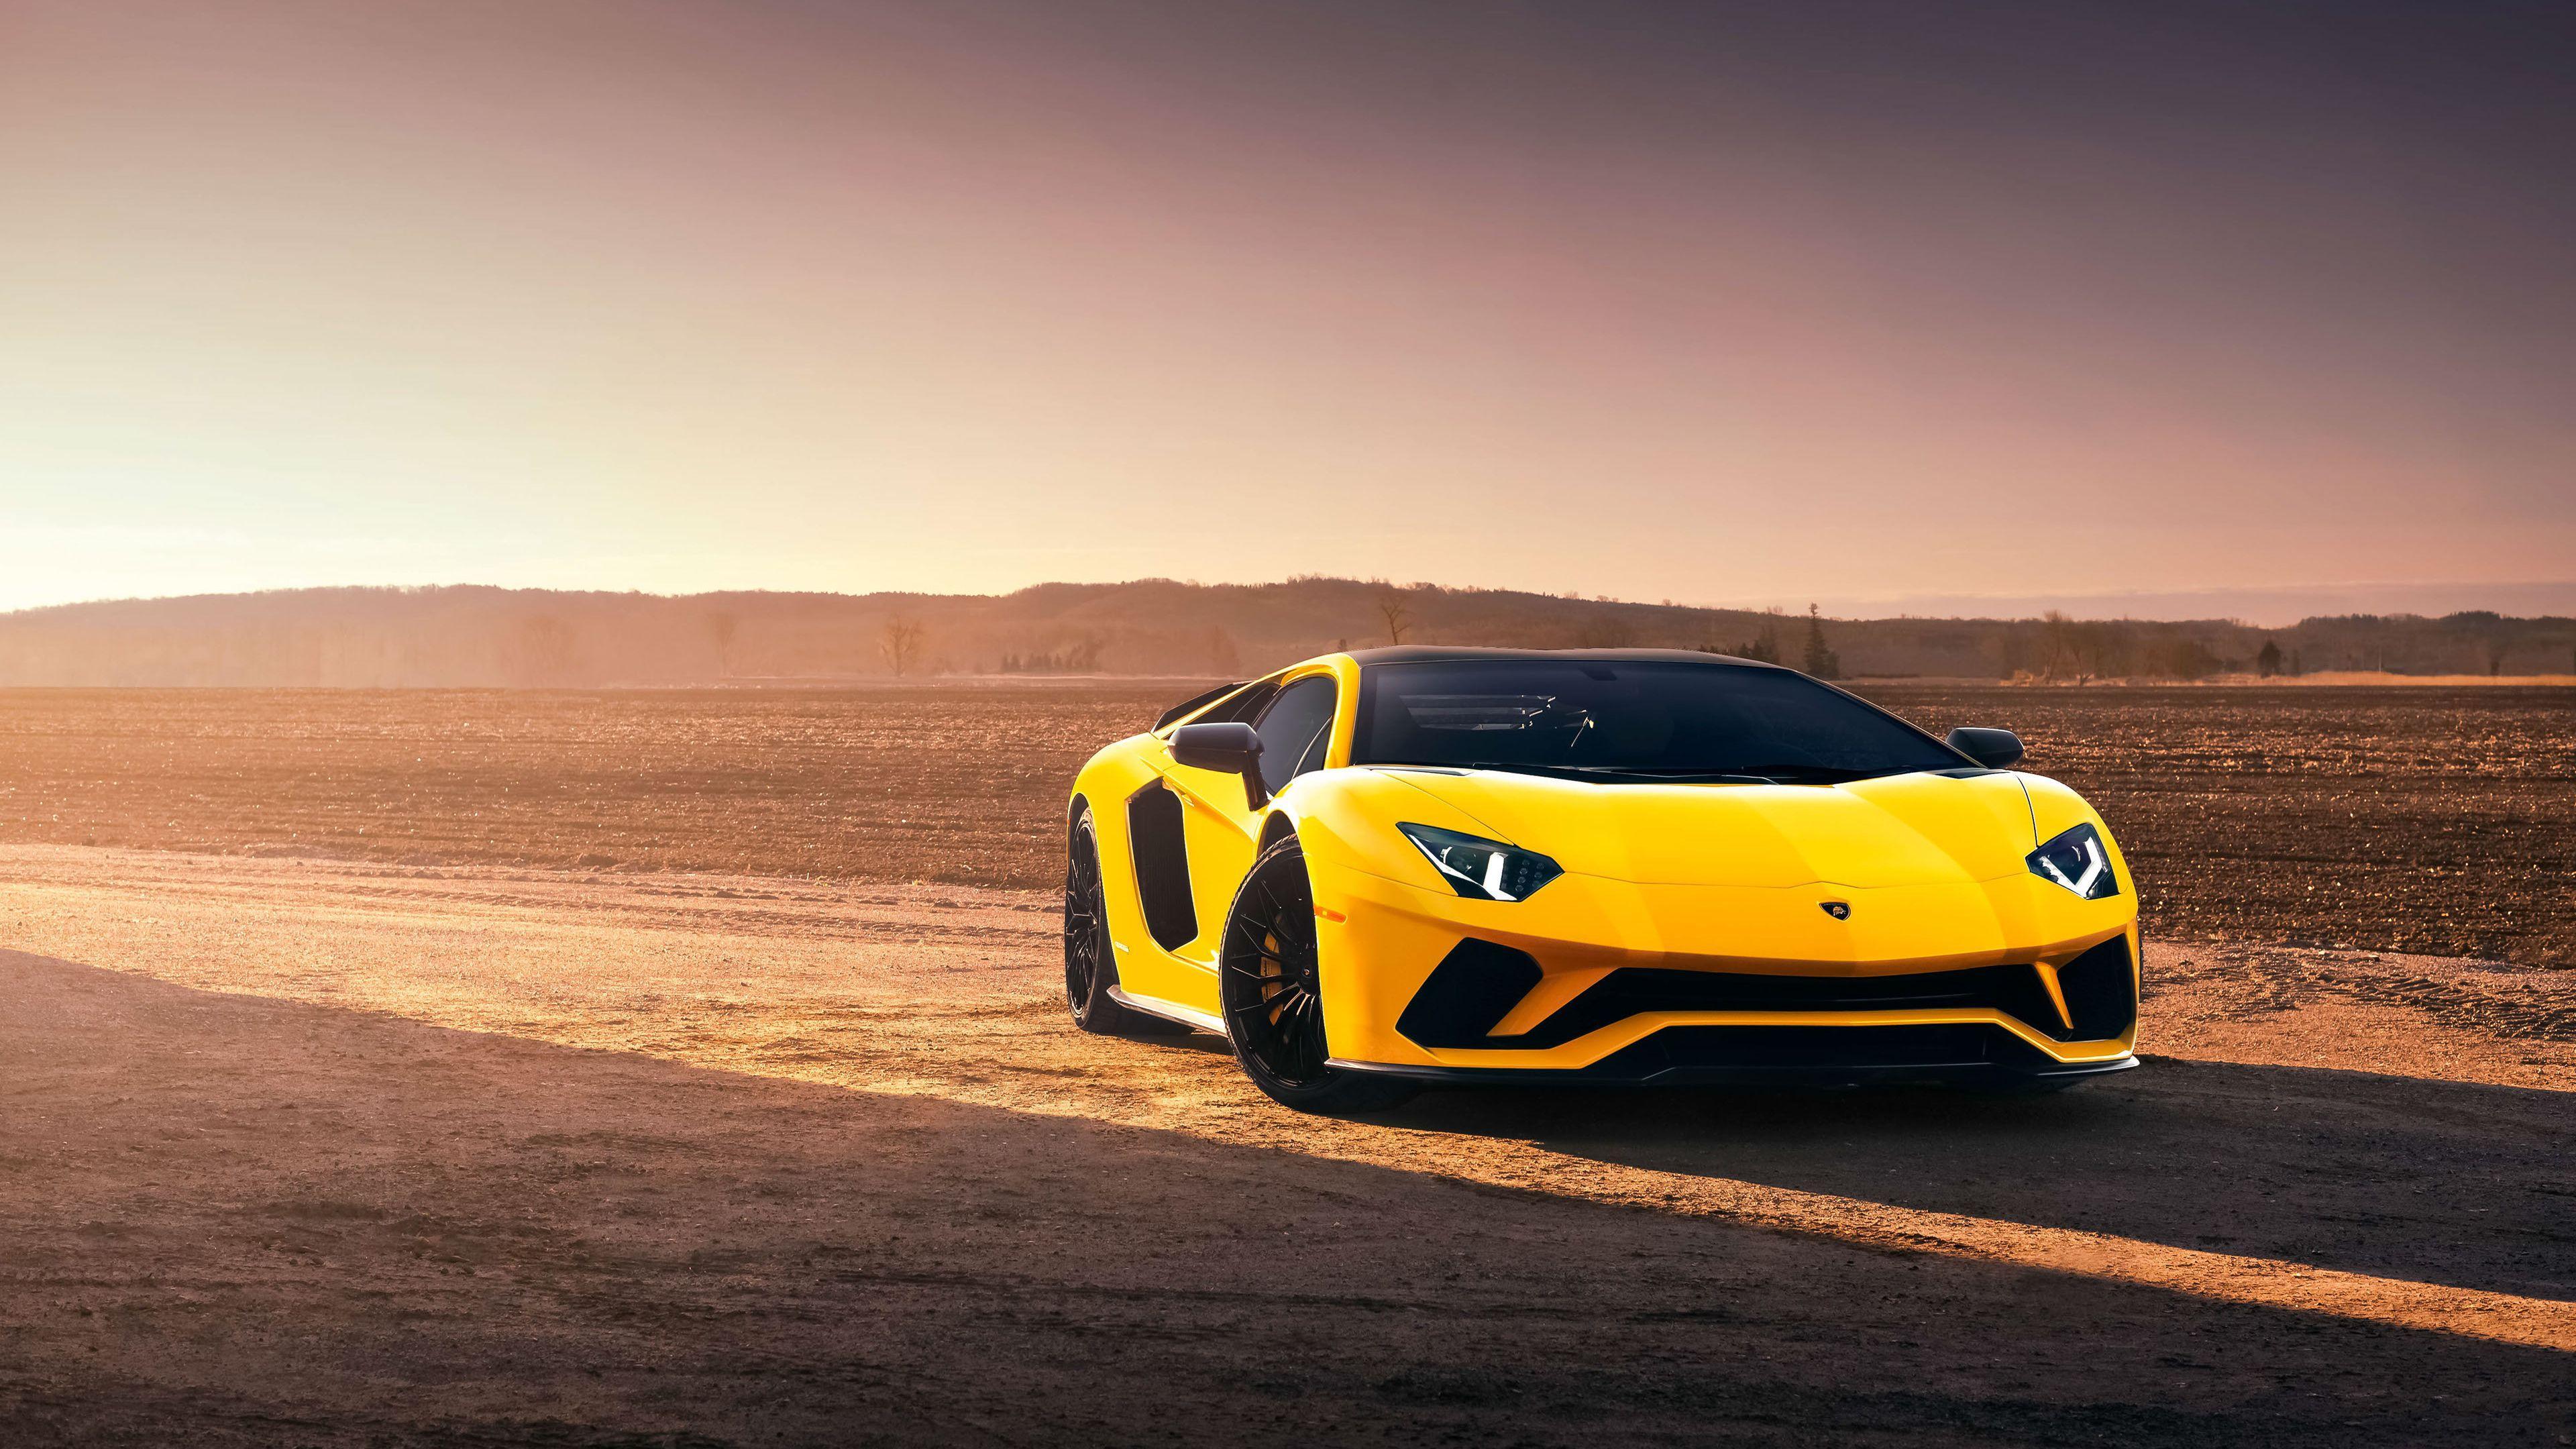 Lamborghini 4k Wallpapers Top Free Lamborghini 4k Backgrounds Wallpaperaccess